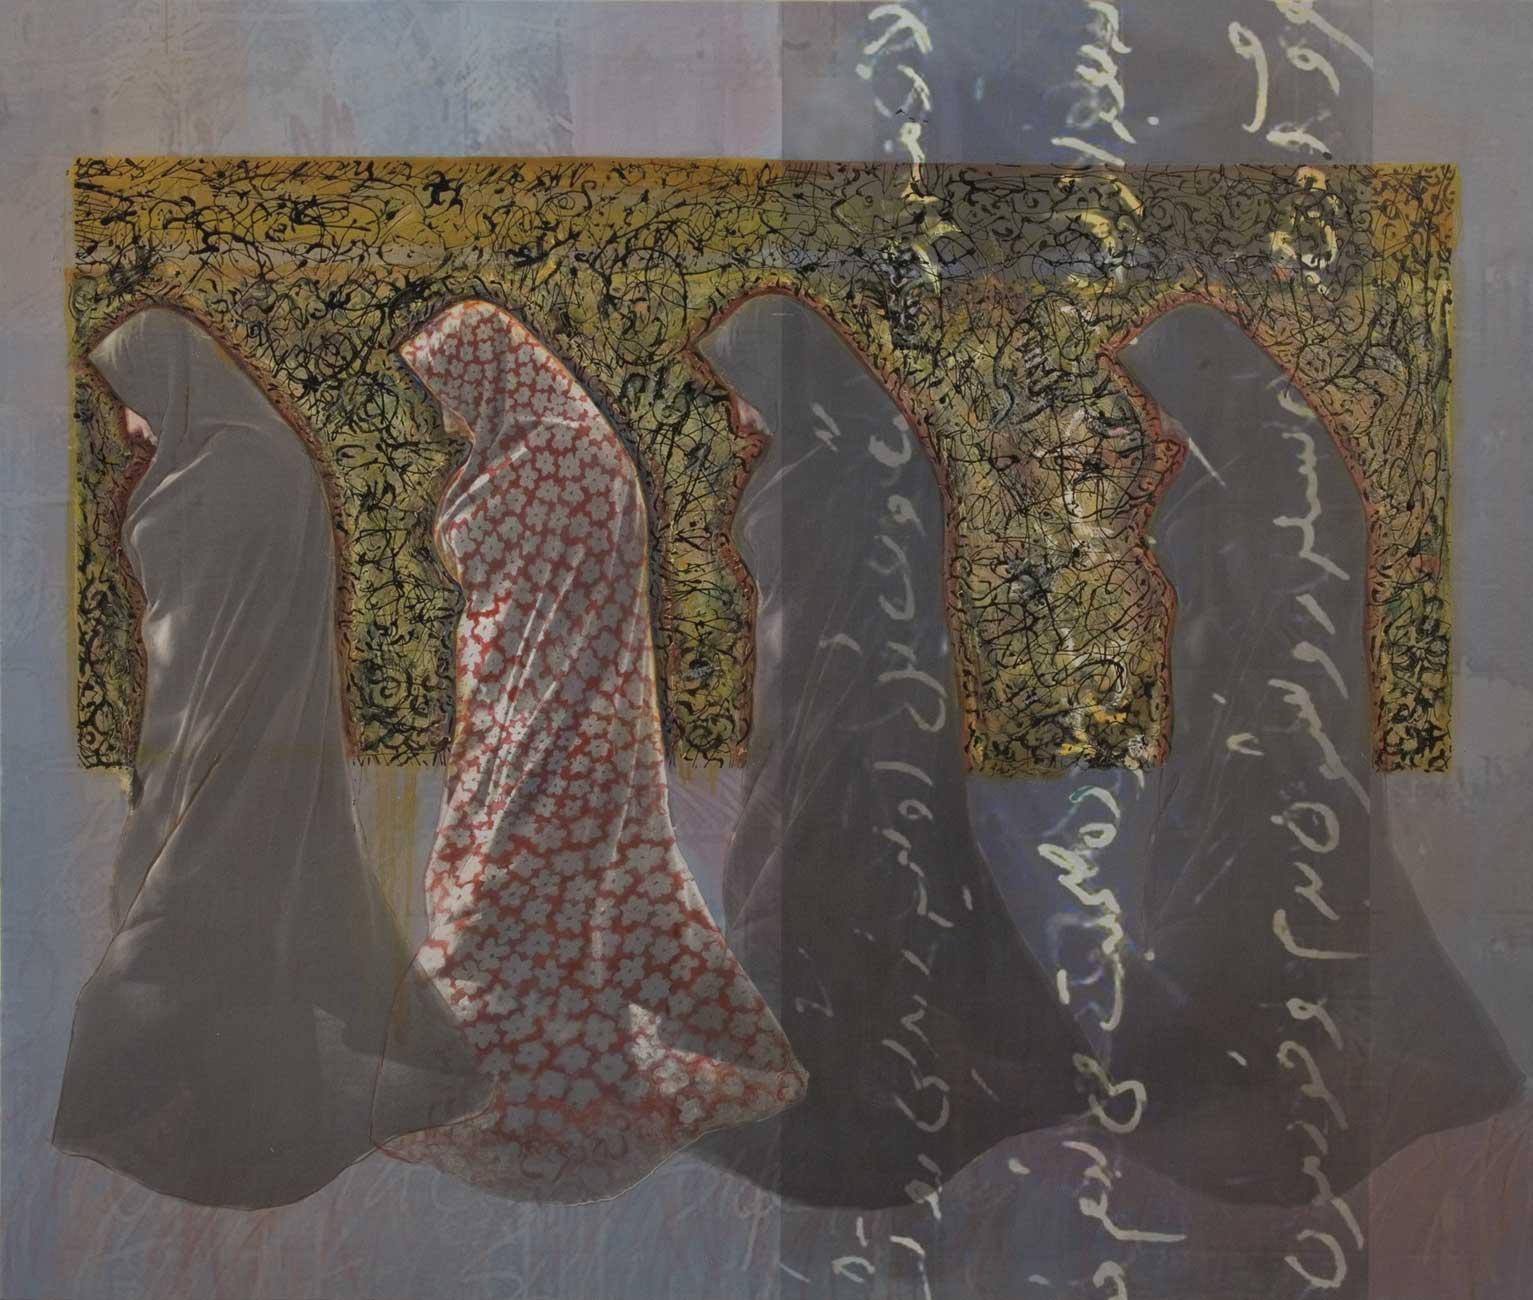 KOUS-0011-Koroush-Salehi_Walk-in-the-Right-Side_Mixed-media-on-canvas_110x130-cm_2011